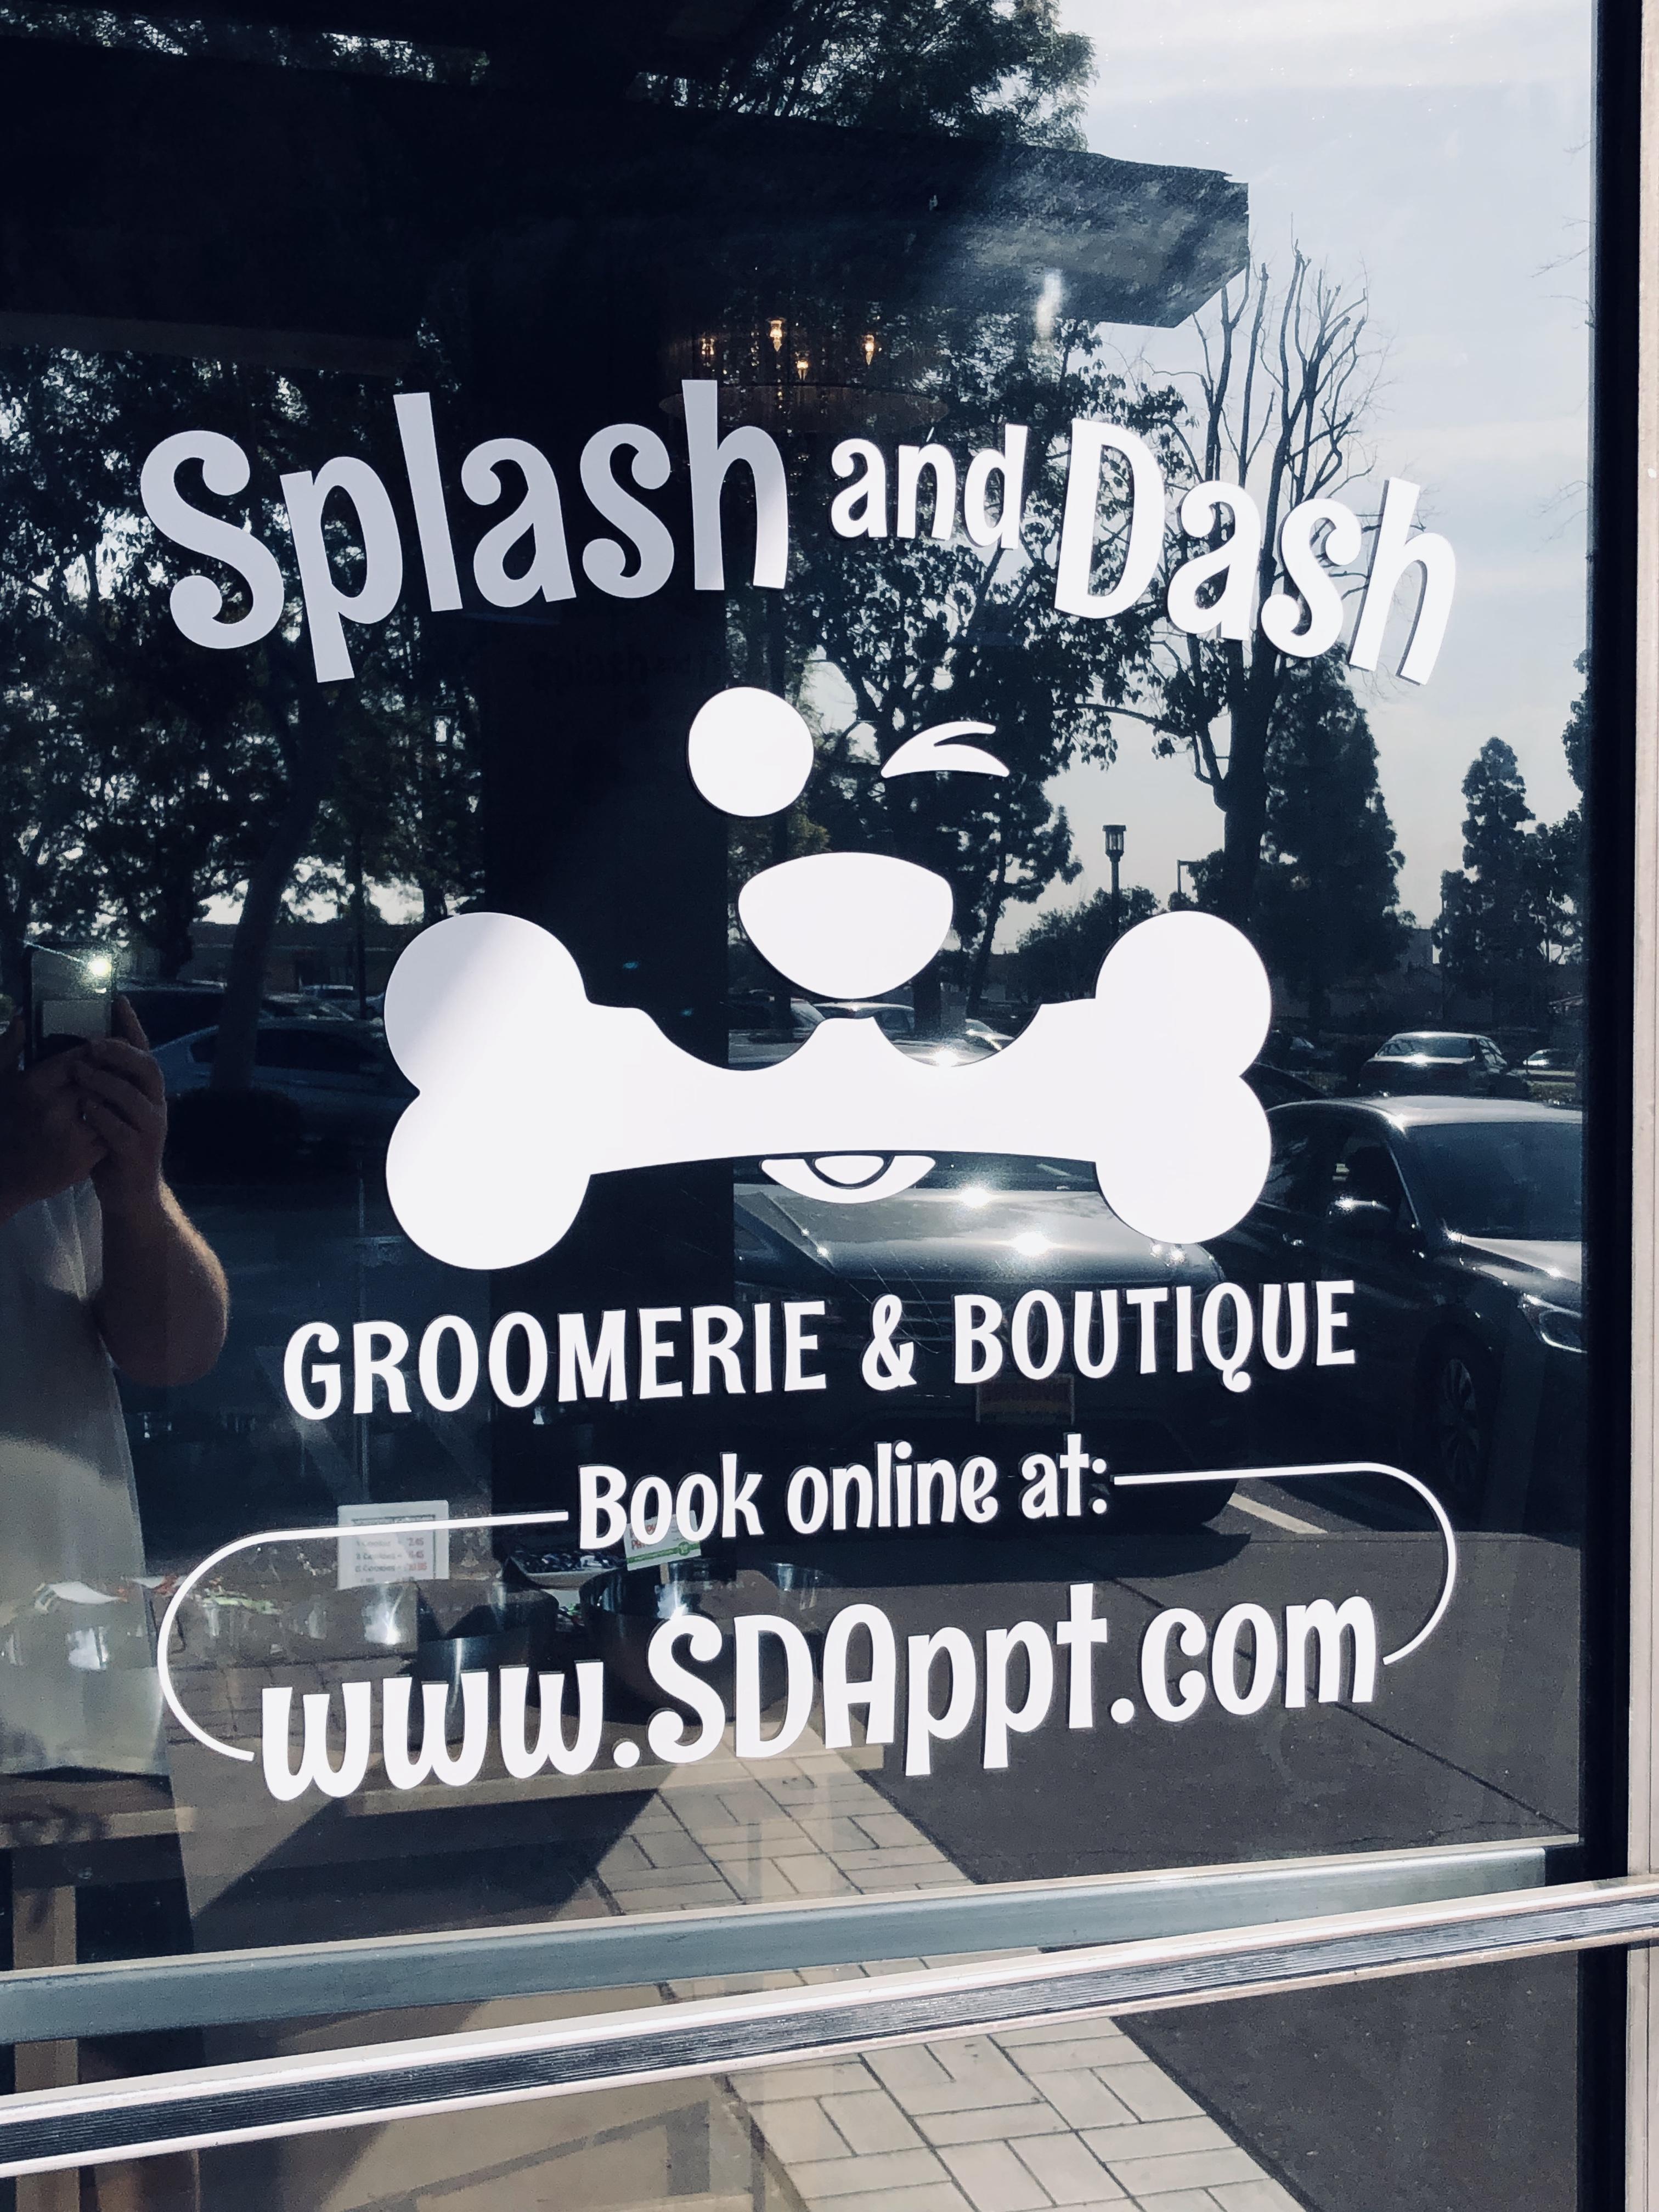 Splash and Dash Groomerie & Boutique La Verne (909)593-5714